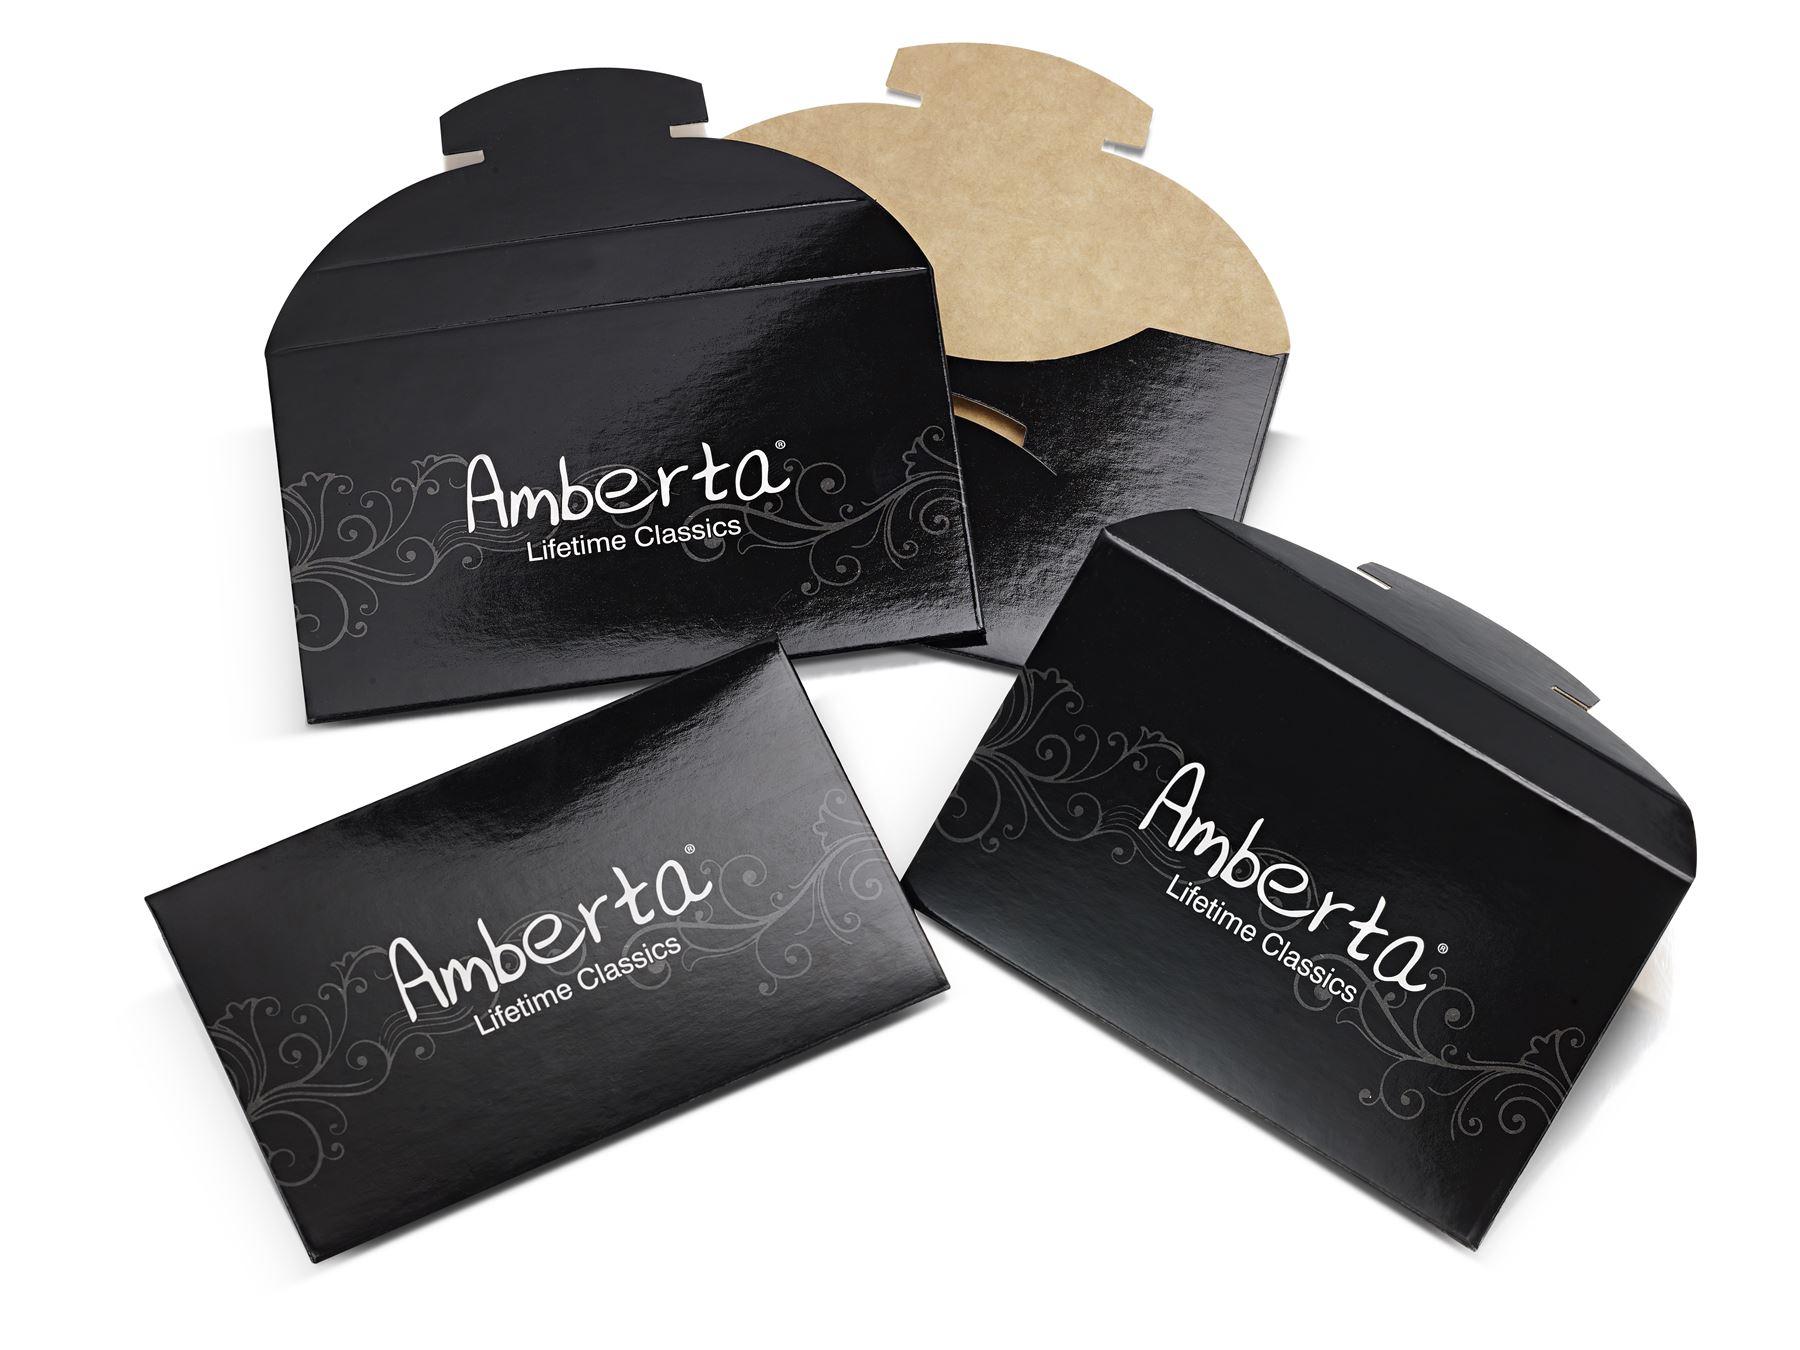 Amberta-Medallon-en-Fina-Plata-De-Ley-925-en-Formas-Diferentes-Para-Foto-y-Gemas miniatura 20